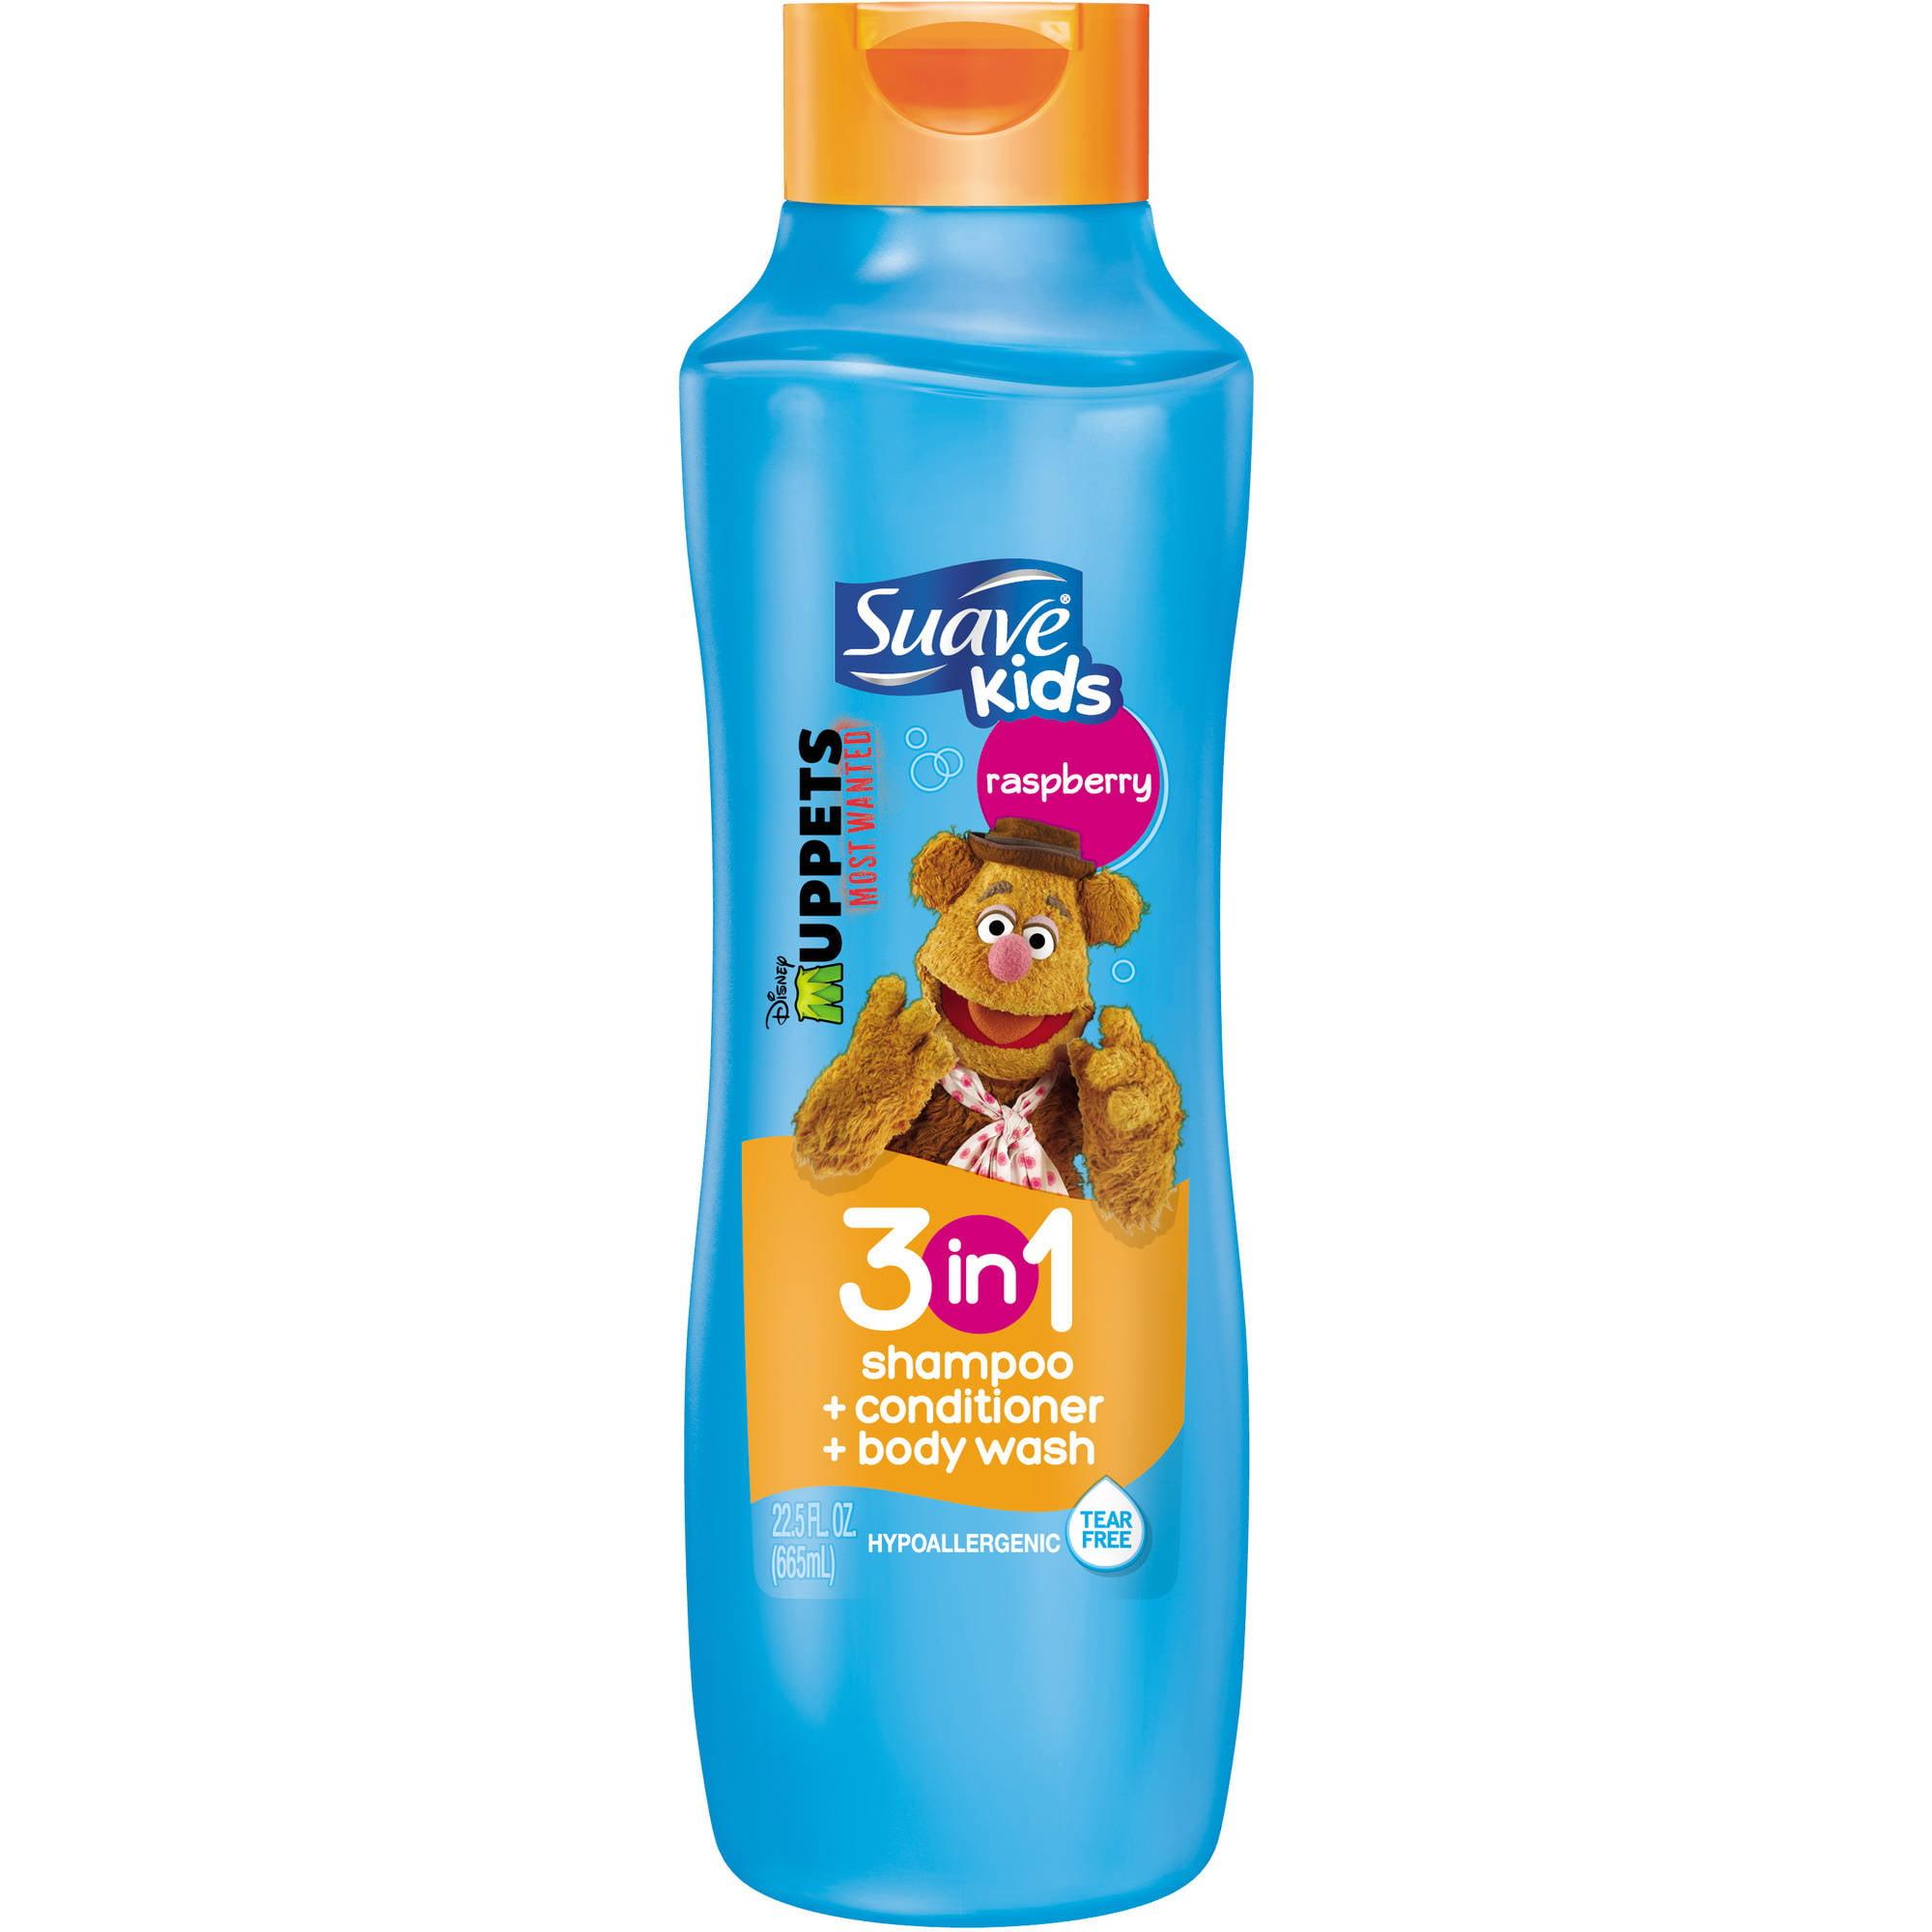 Suave Kids Raspberry 3 in 1 Shampoo Conditioner and Body Wash, 22.5 fl oz